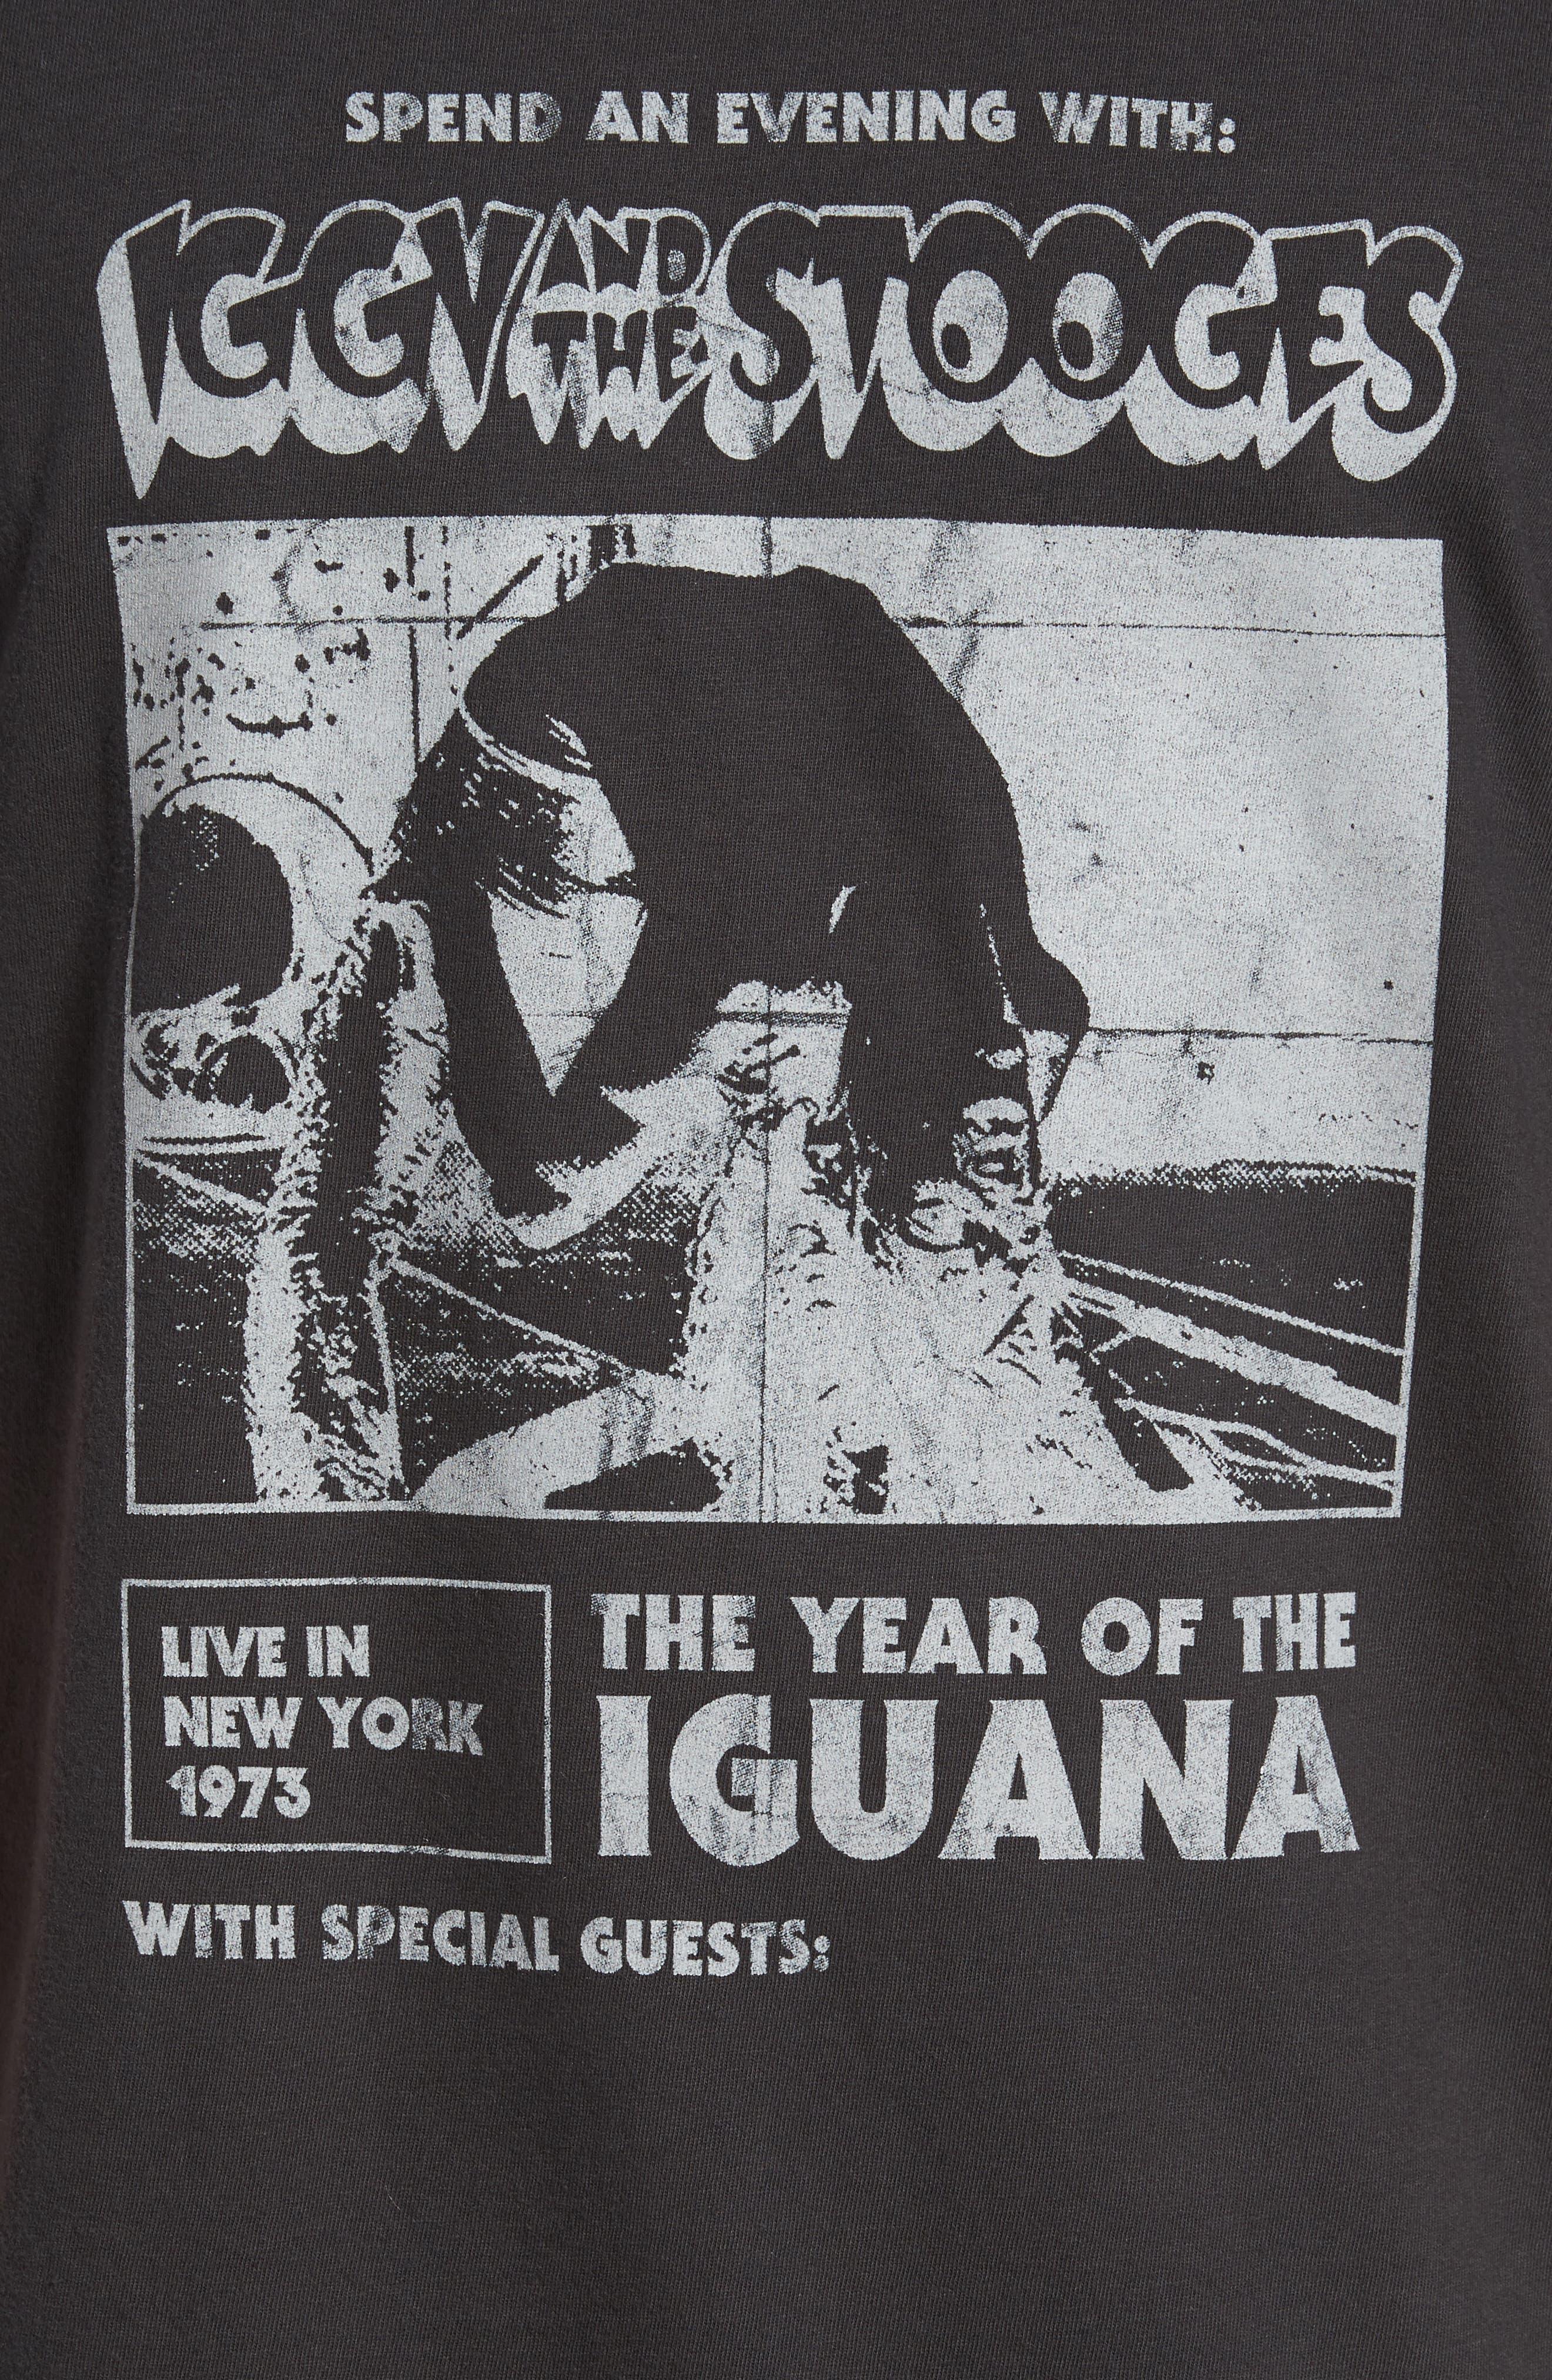 Iggy Pop x Billabong Iguana T-Shirt,                             Alternate thumbnail 5, color,                             001